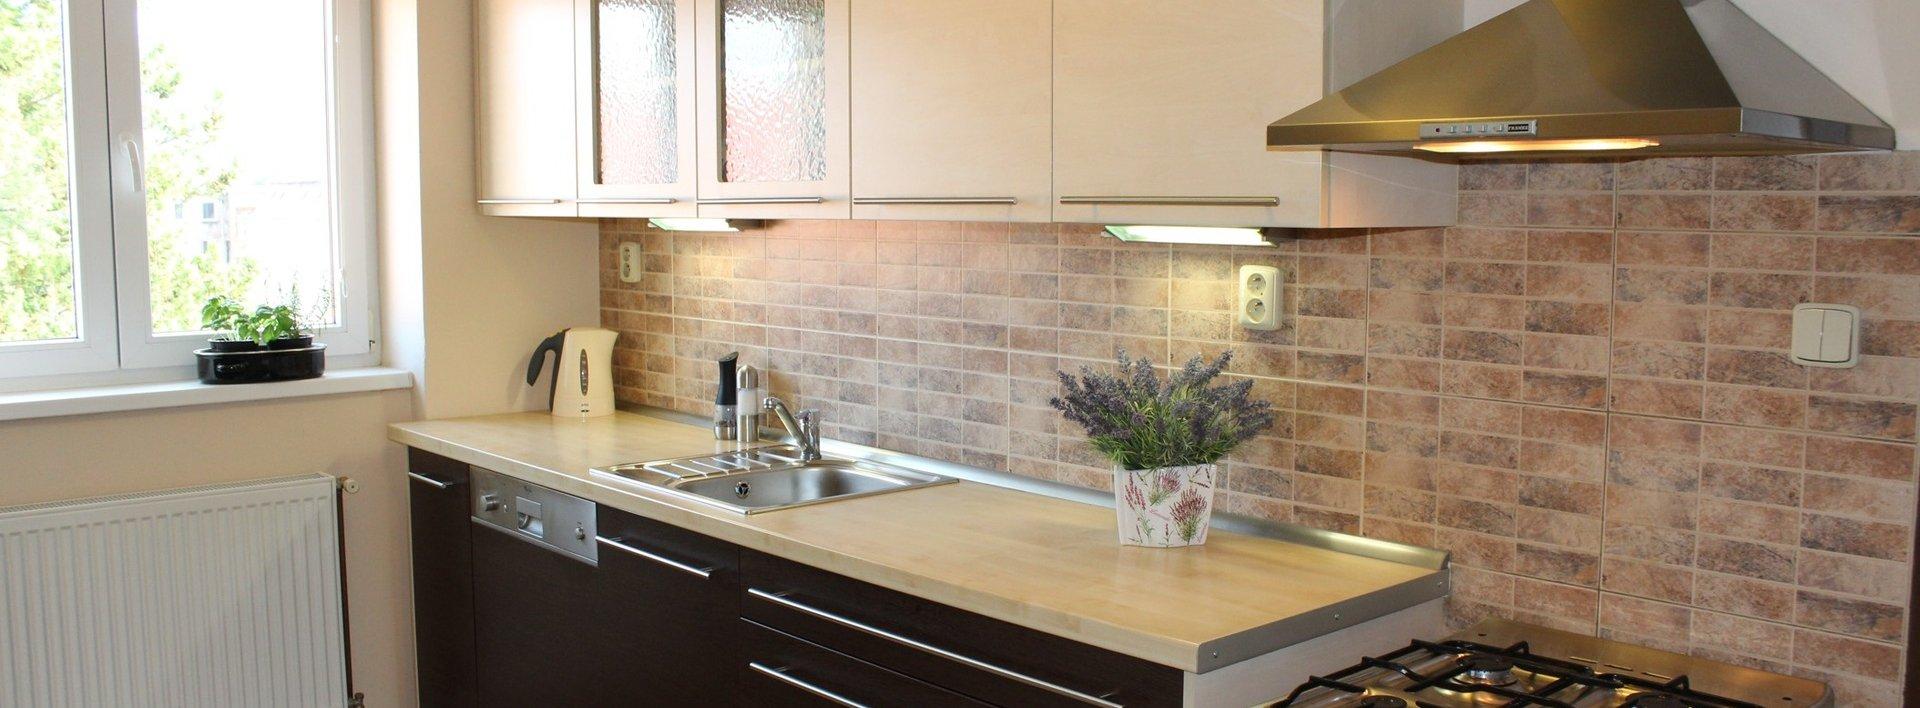 Prodej bytu 2+1, 55m², Ev.č.: N47865